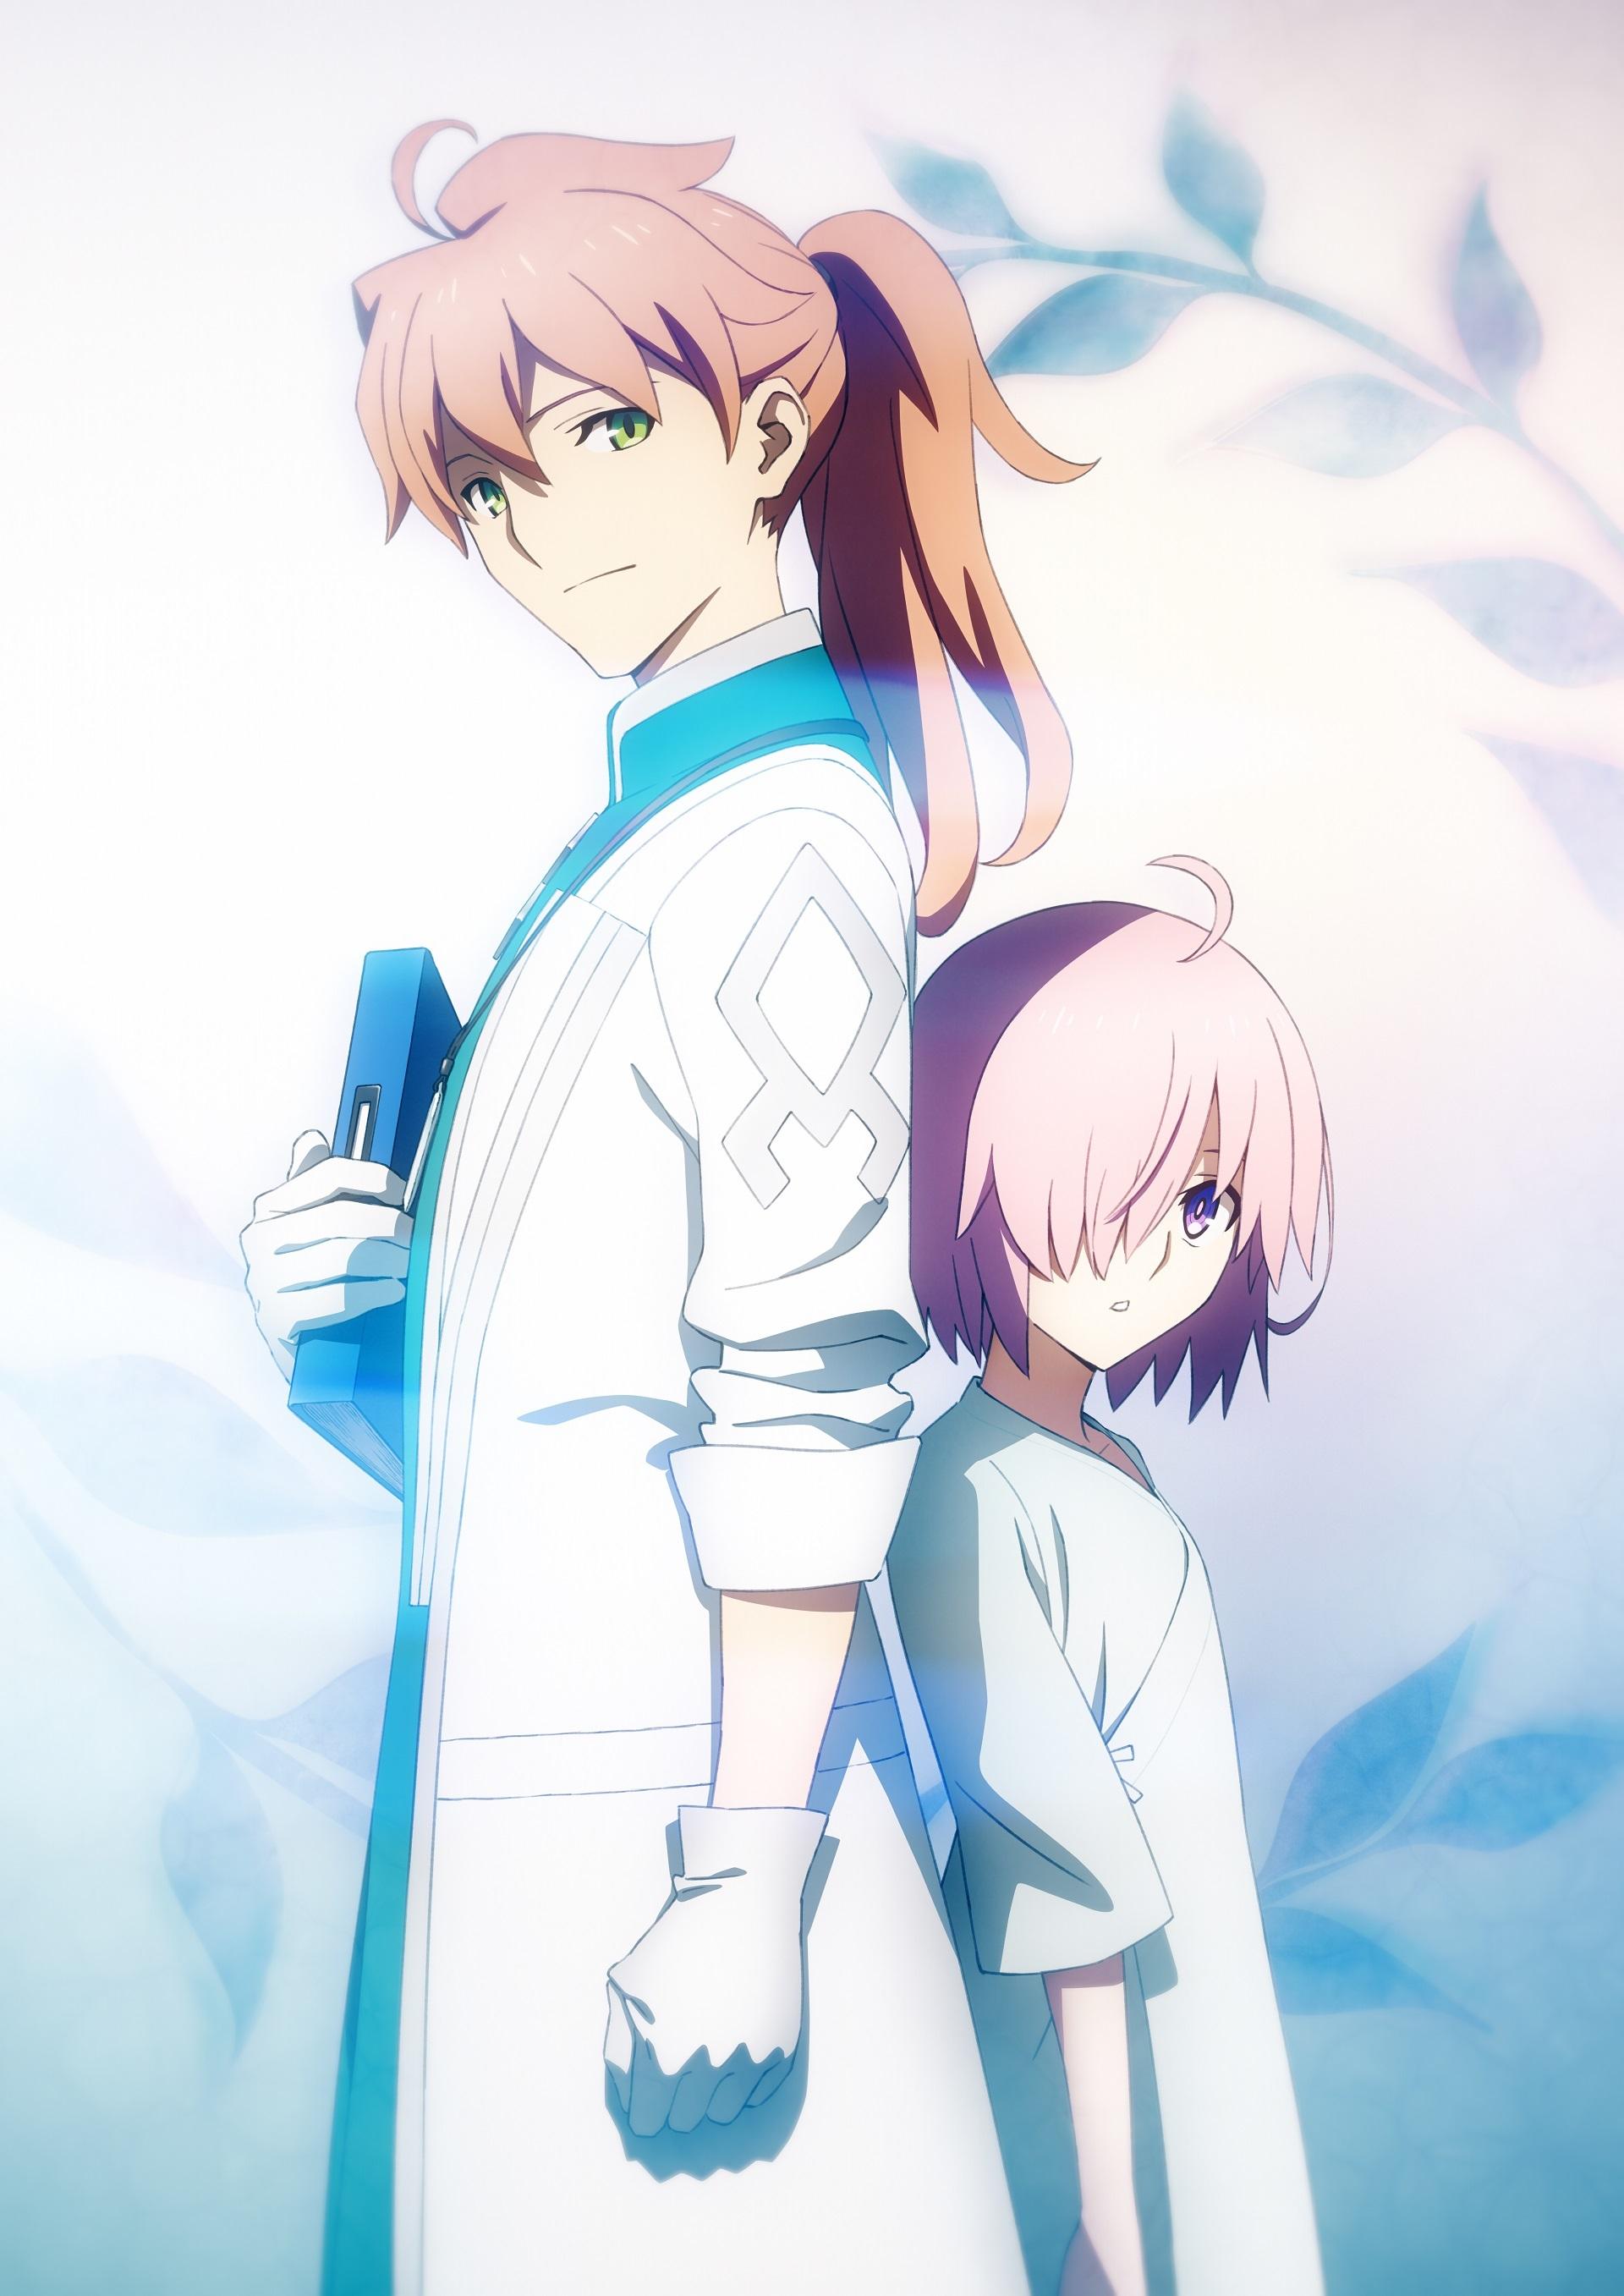 『Fate/Grand Order-絶対魔獣戦線バビロニア』Episode 0 「Initium Iter」 (C)TYPE-MOON / FGO7 ANIME PROJECT